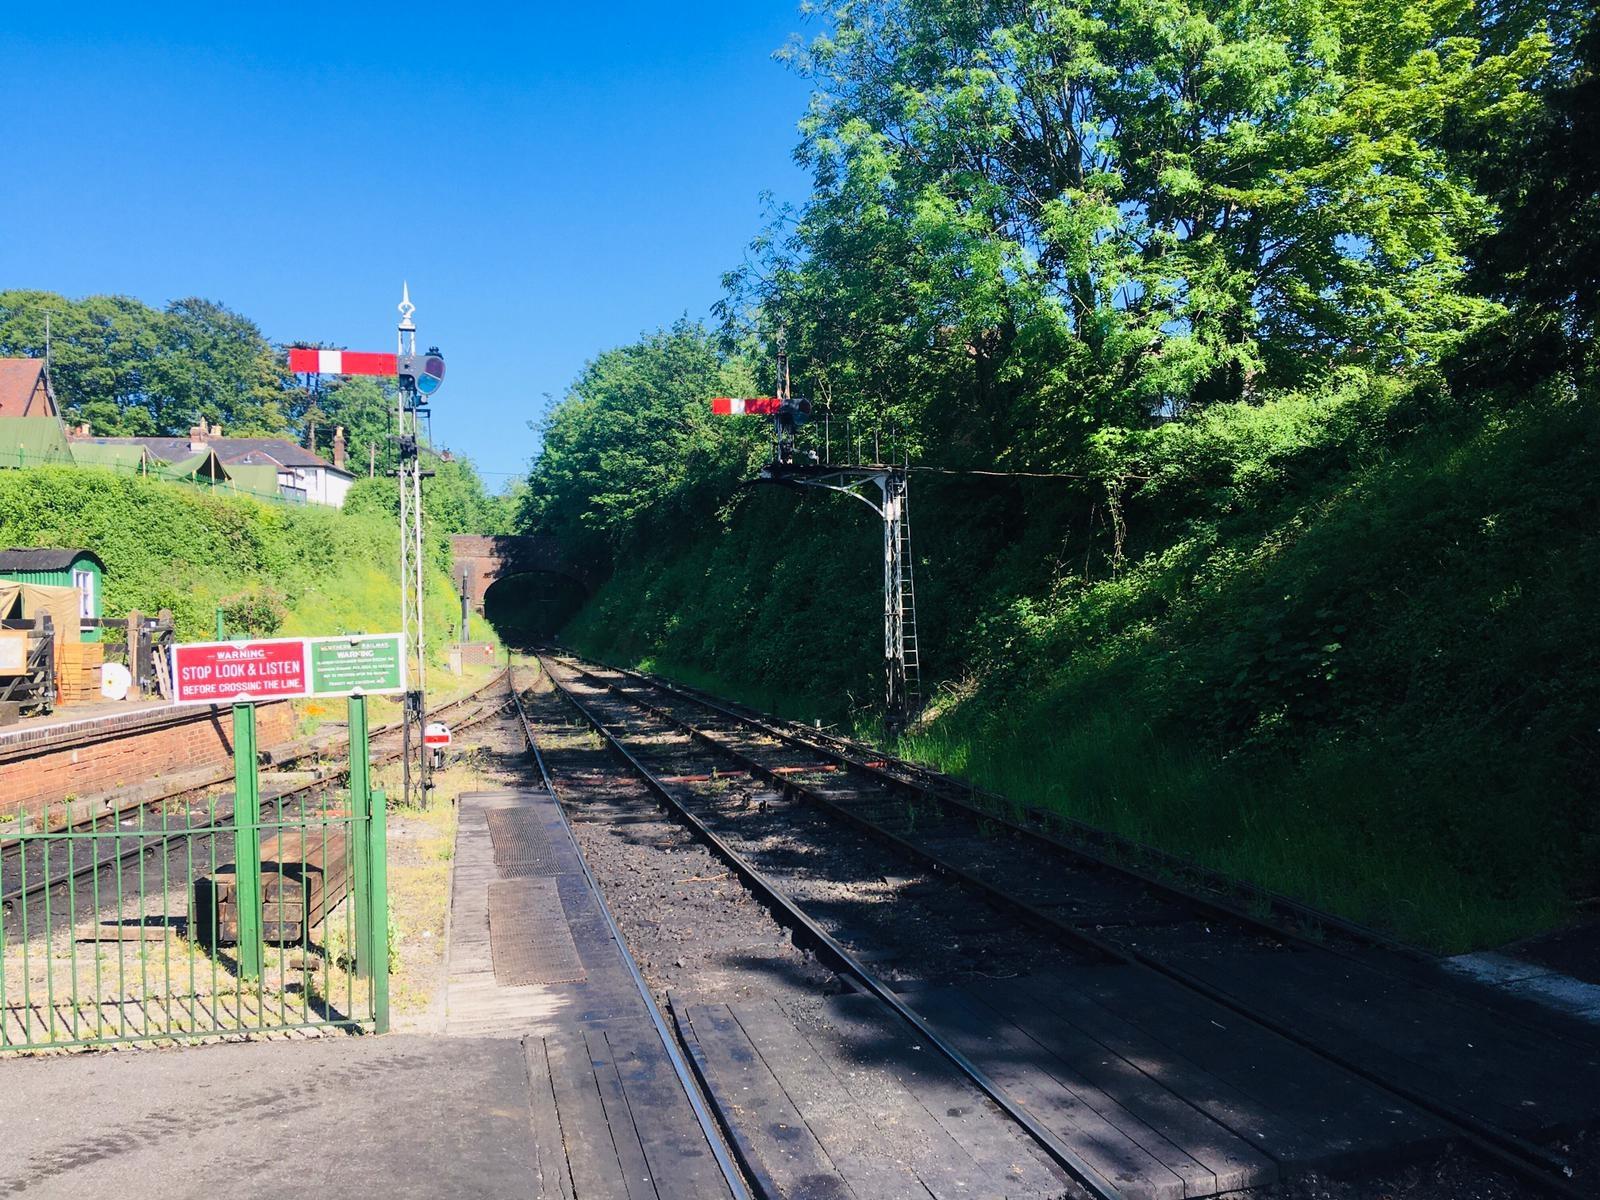 Sunshine and Signals at Alresford